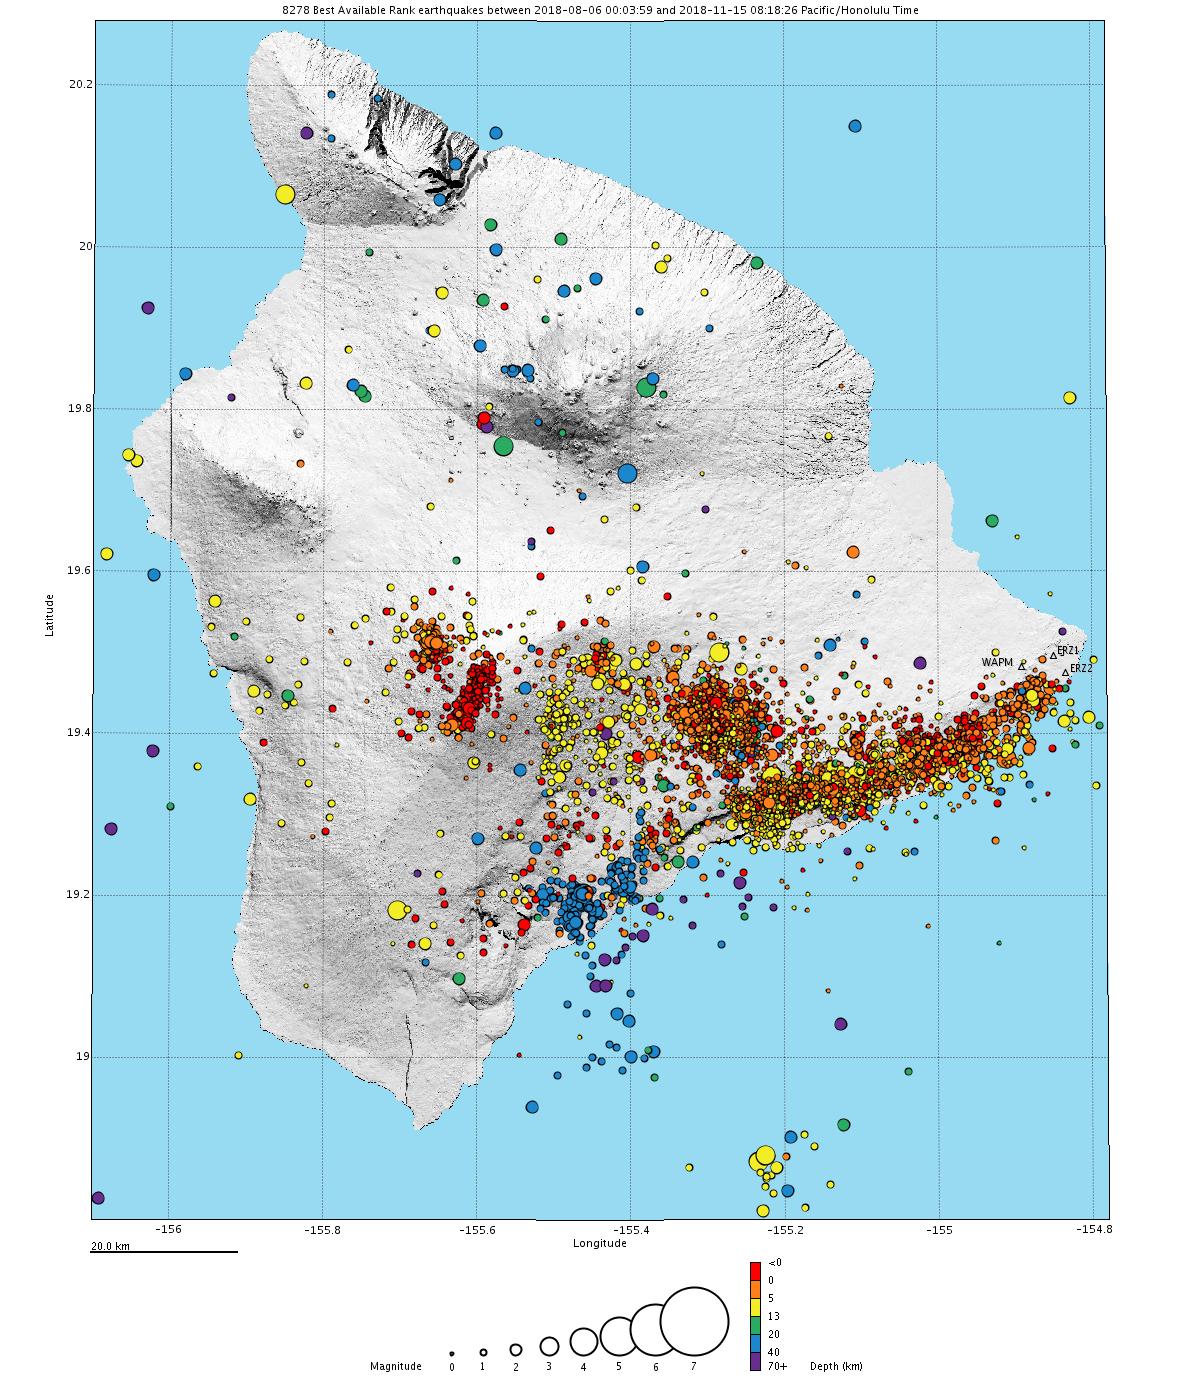 east rift zone of kilauea, hawaii kilauea, first eruption of mount kilauea, last eruption of kilauea, volcano kilauea, on kilauea map usgs